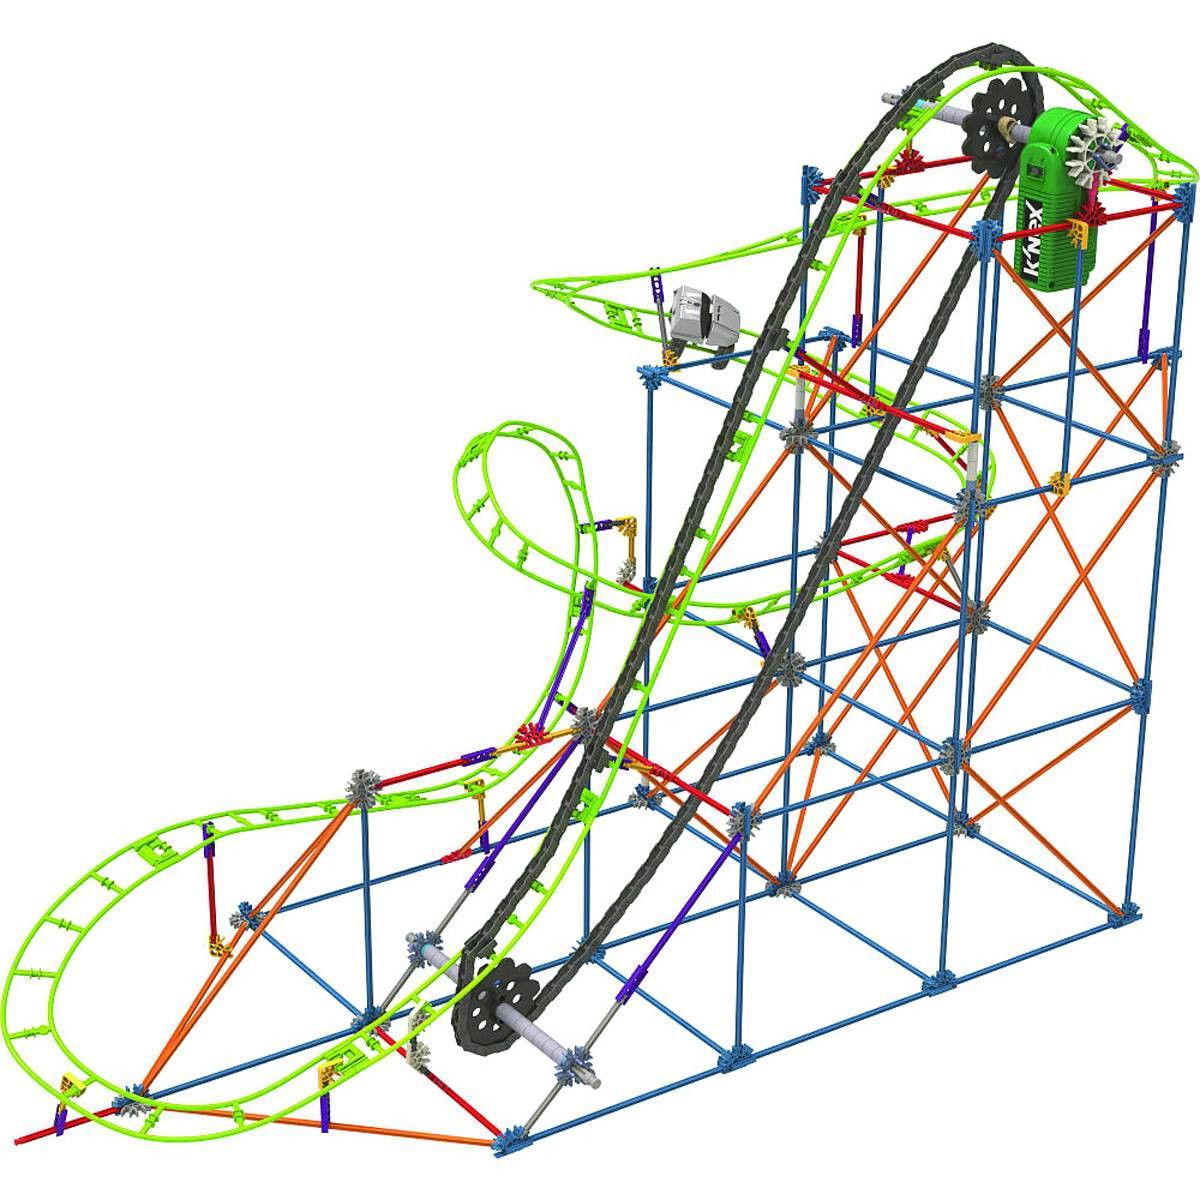 Knex Roller Coasters